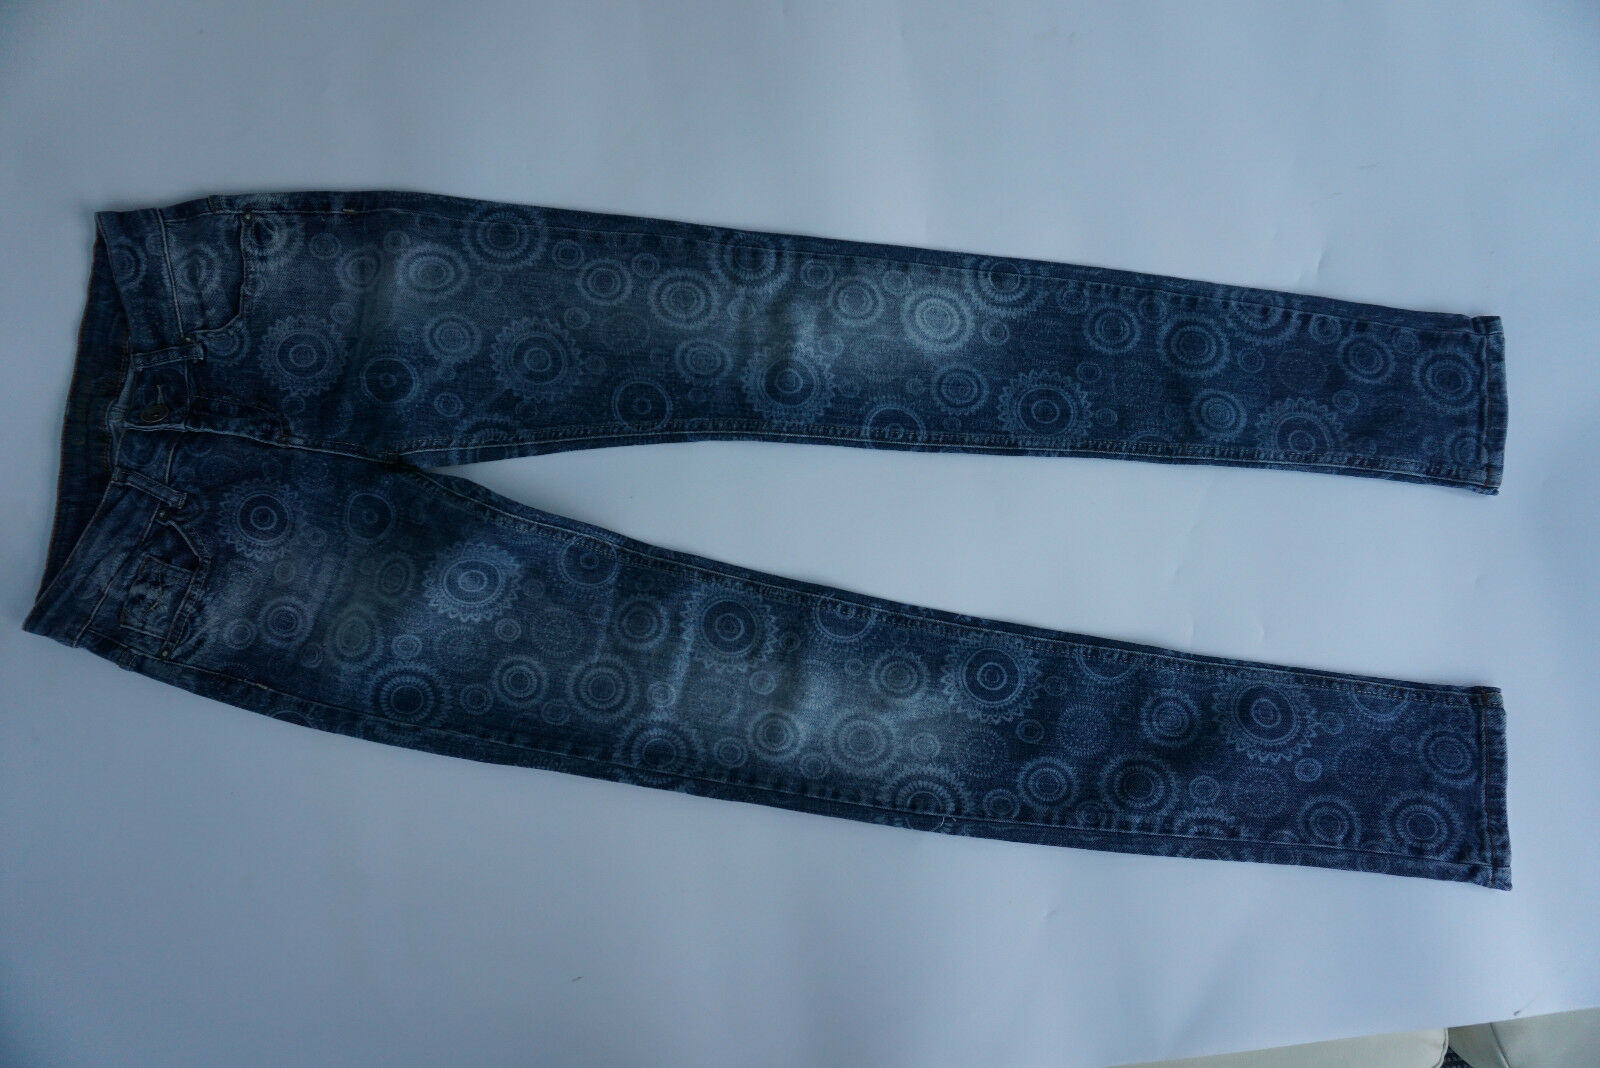 DESIGUAL Damen stretch Jeans Hose slim skinny 24 34 W24 L34 blau gemustert  17k